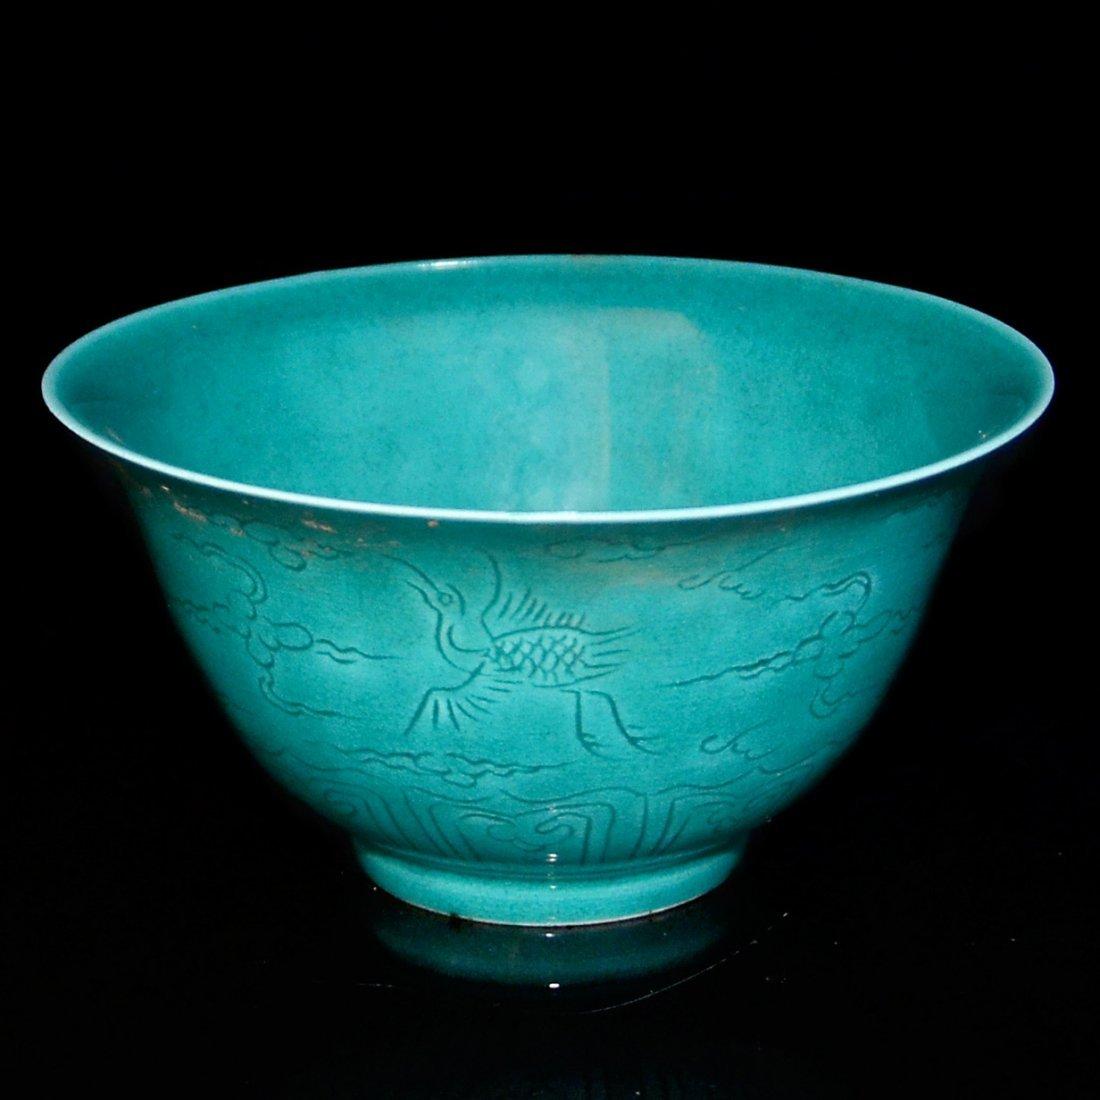 Ming, A Rare Peacock-Blue-Glazed Bowl - 2